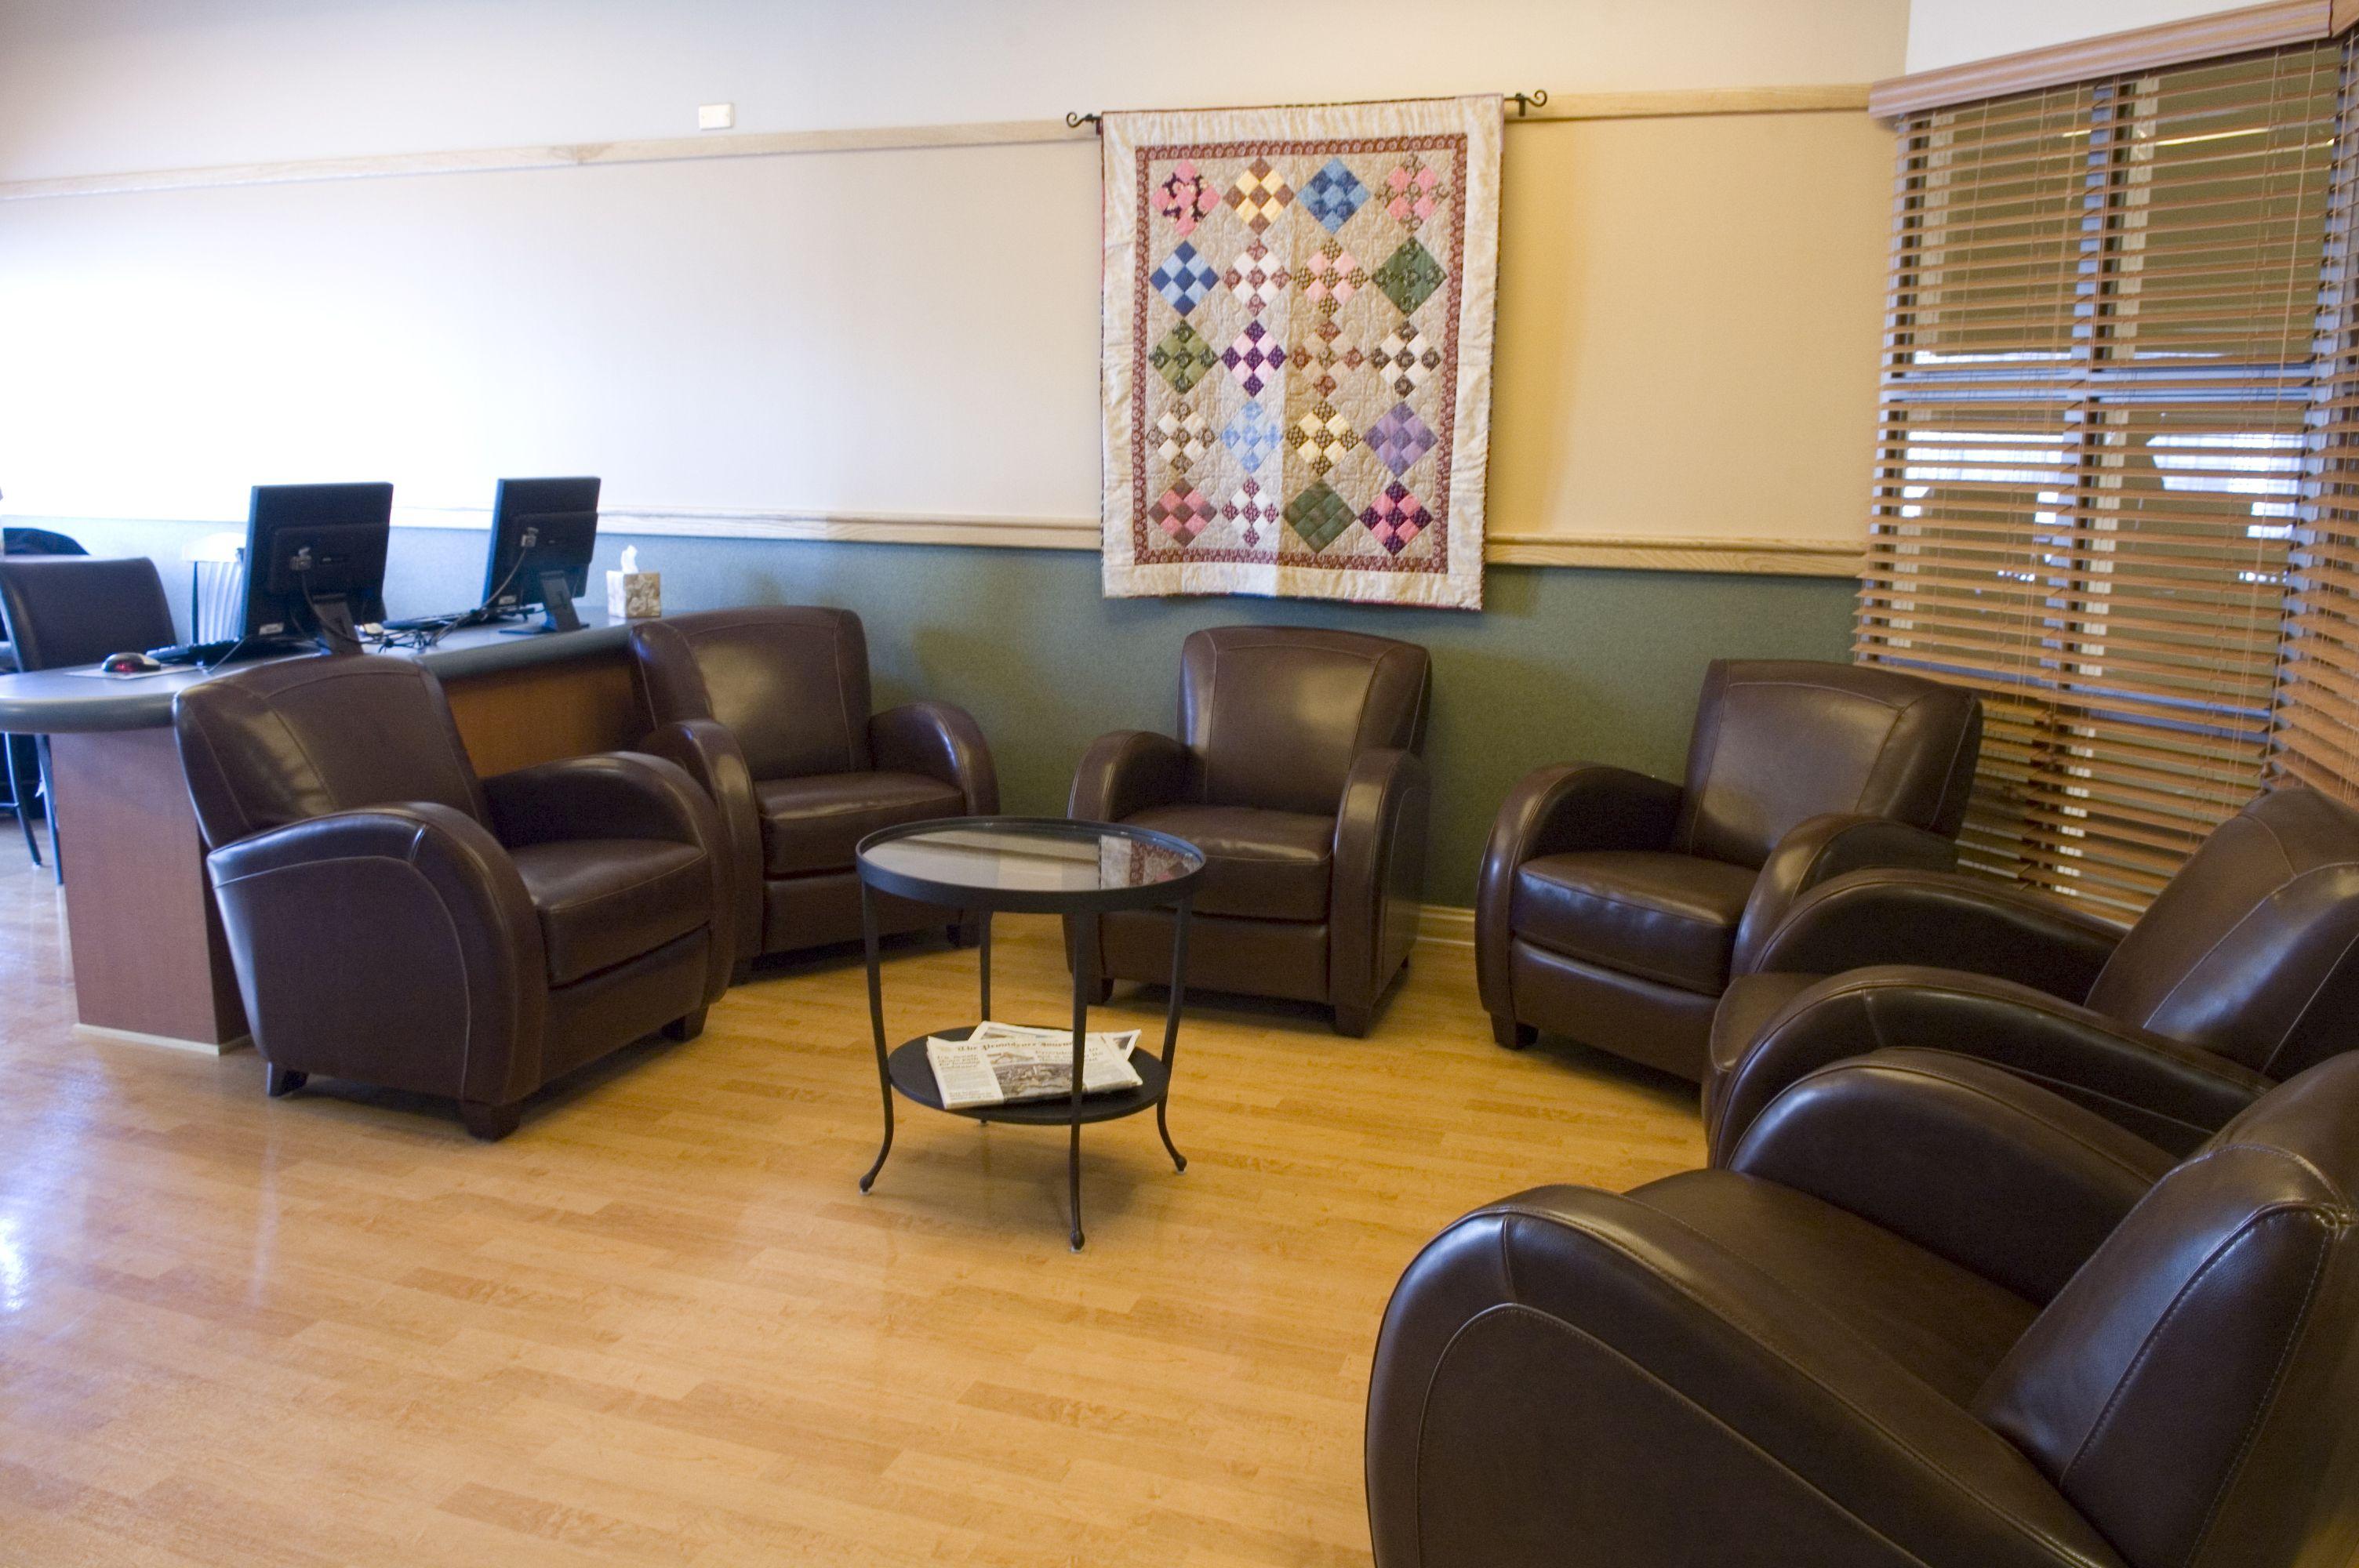 Ronald Mcdonald Family Room At Hasbro Children S Hospital In